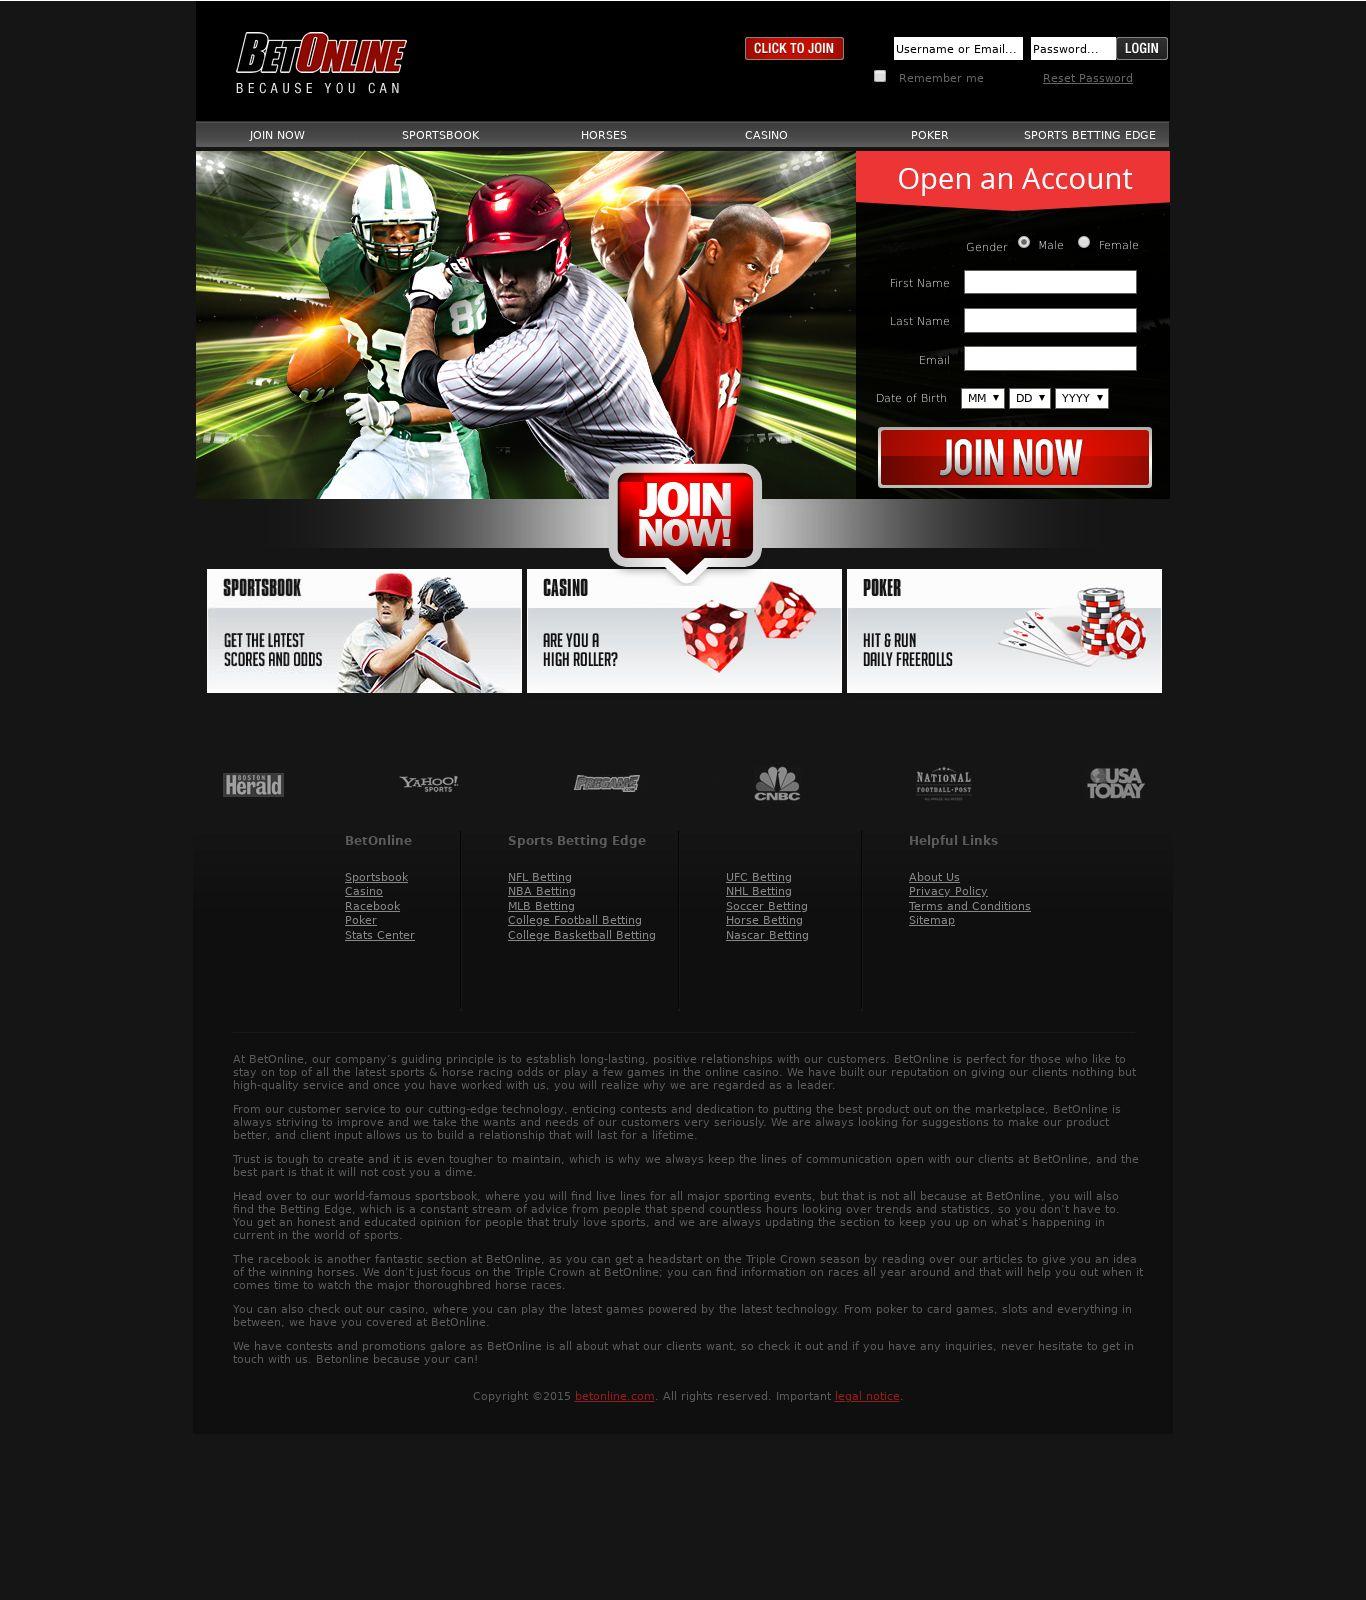 BETONLINE COM | Bet Online Casino Scam or not? - Review